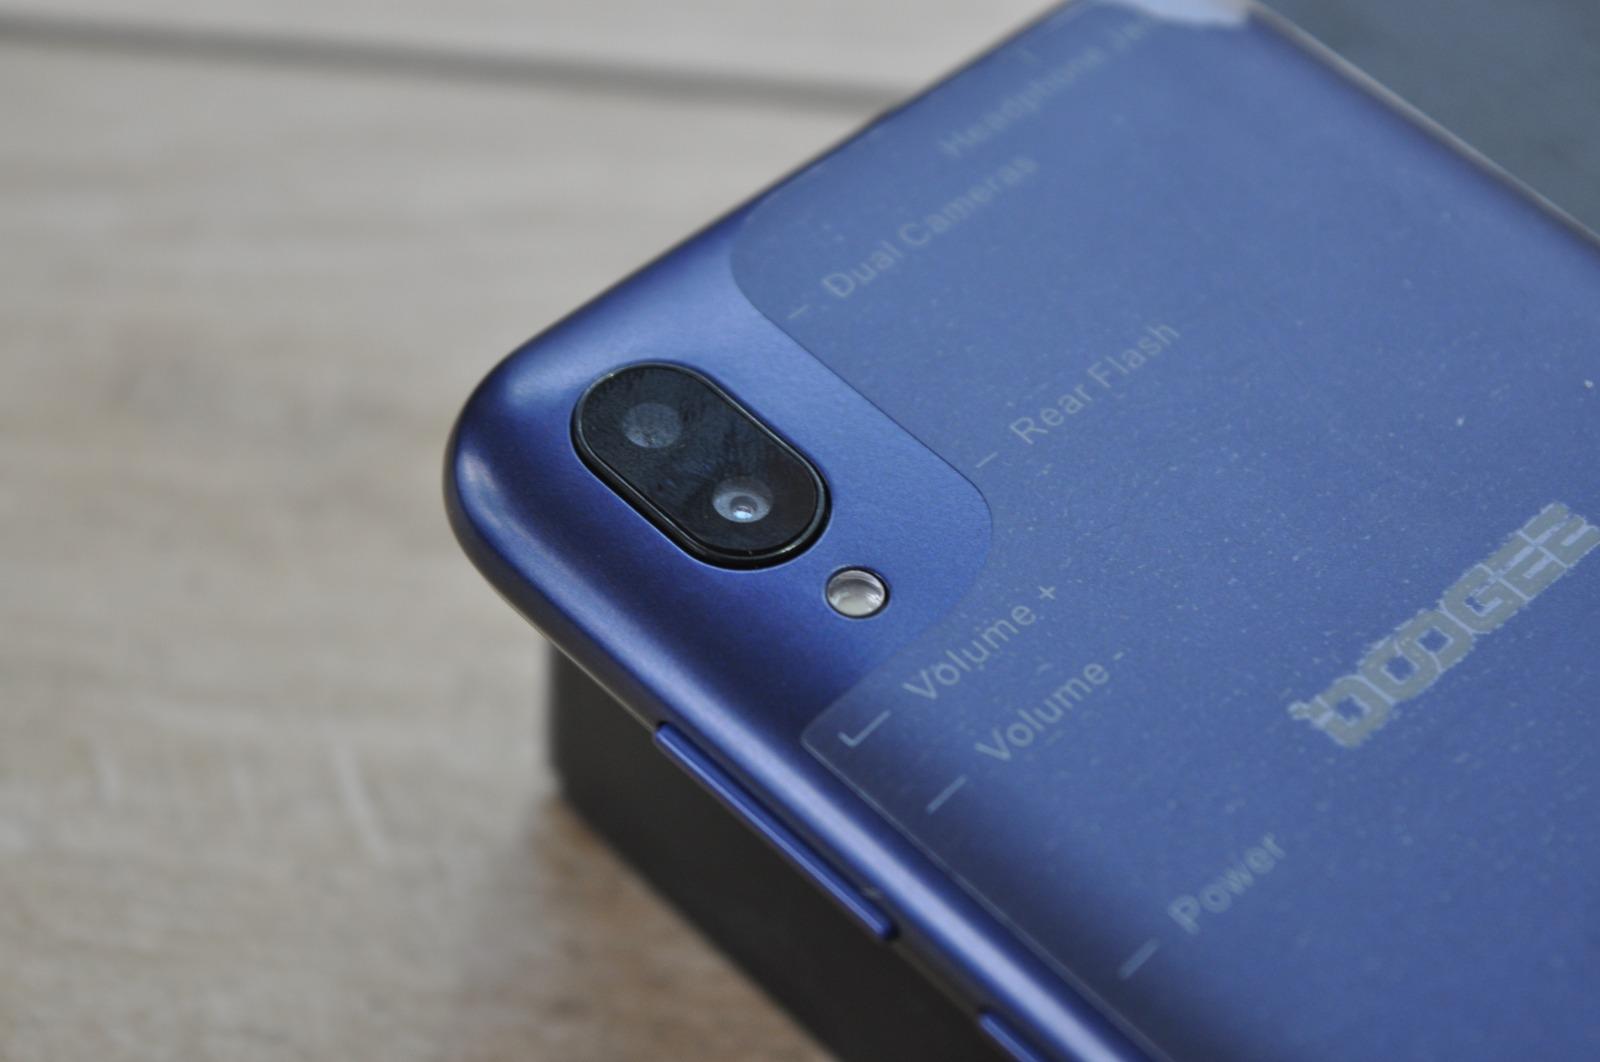 Doogee X90 Il miglior Smartphone economico